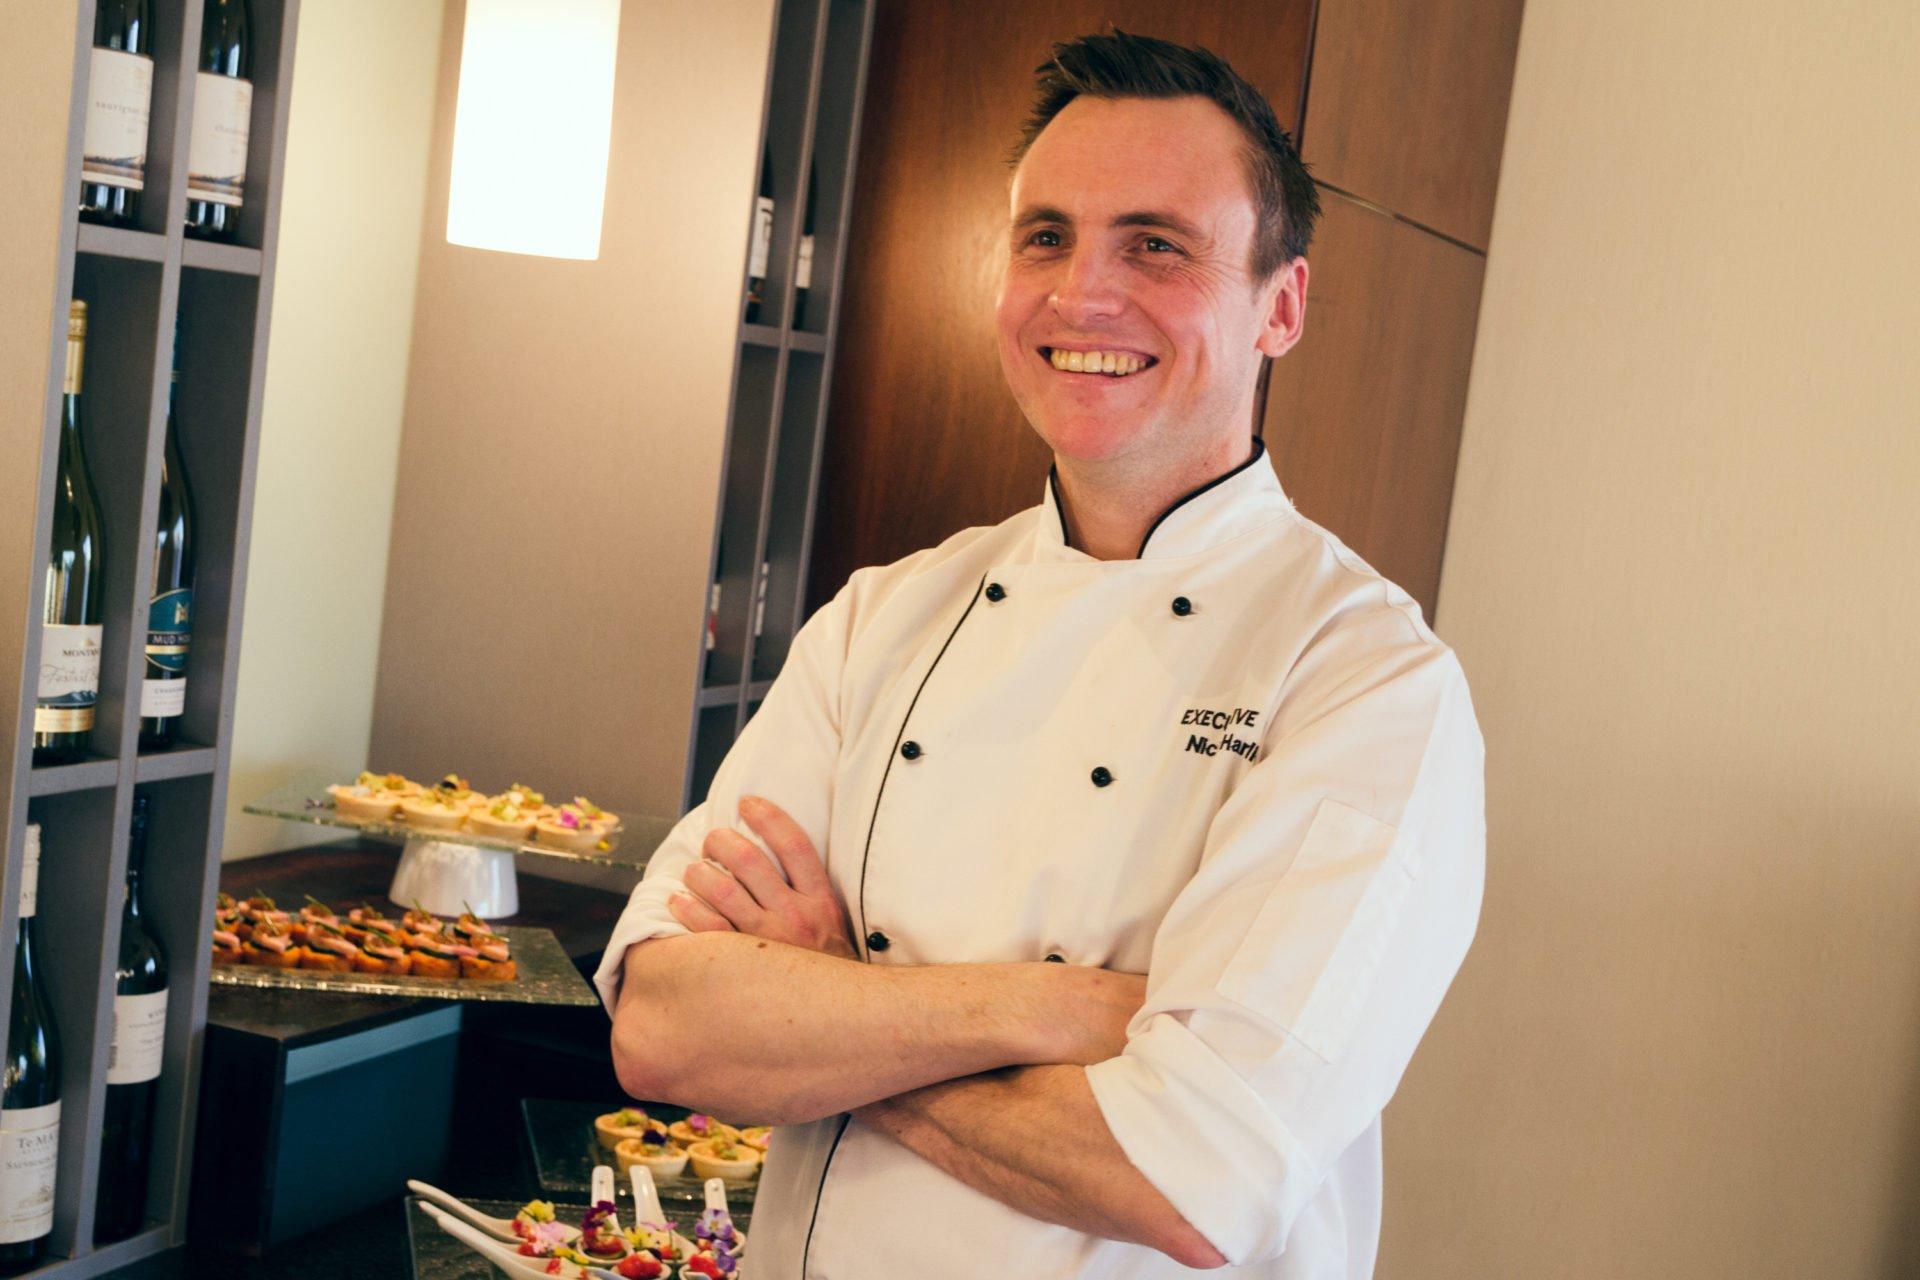 10. Chef - Nick Harlick